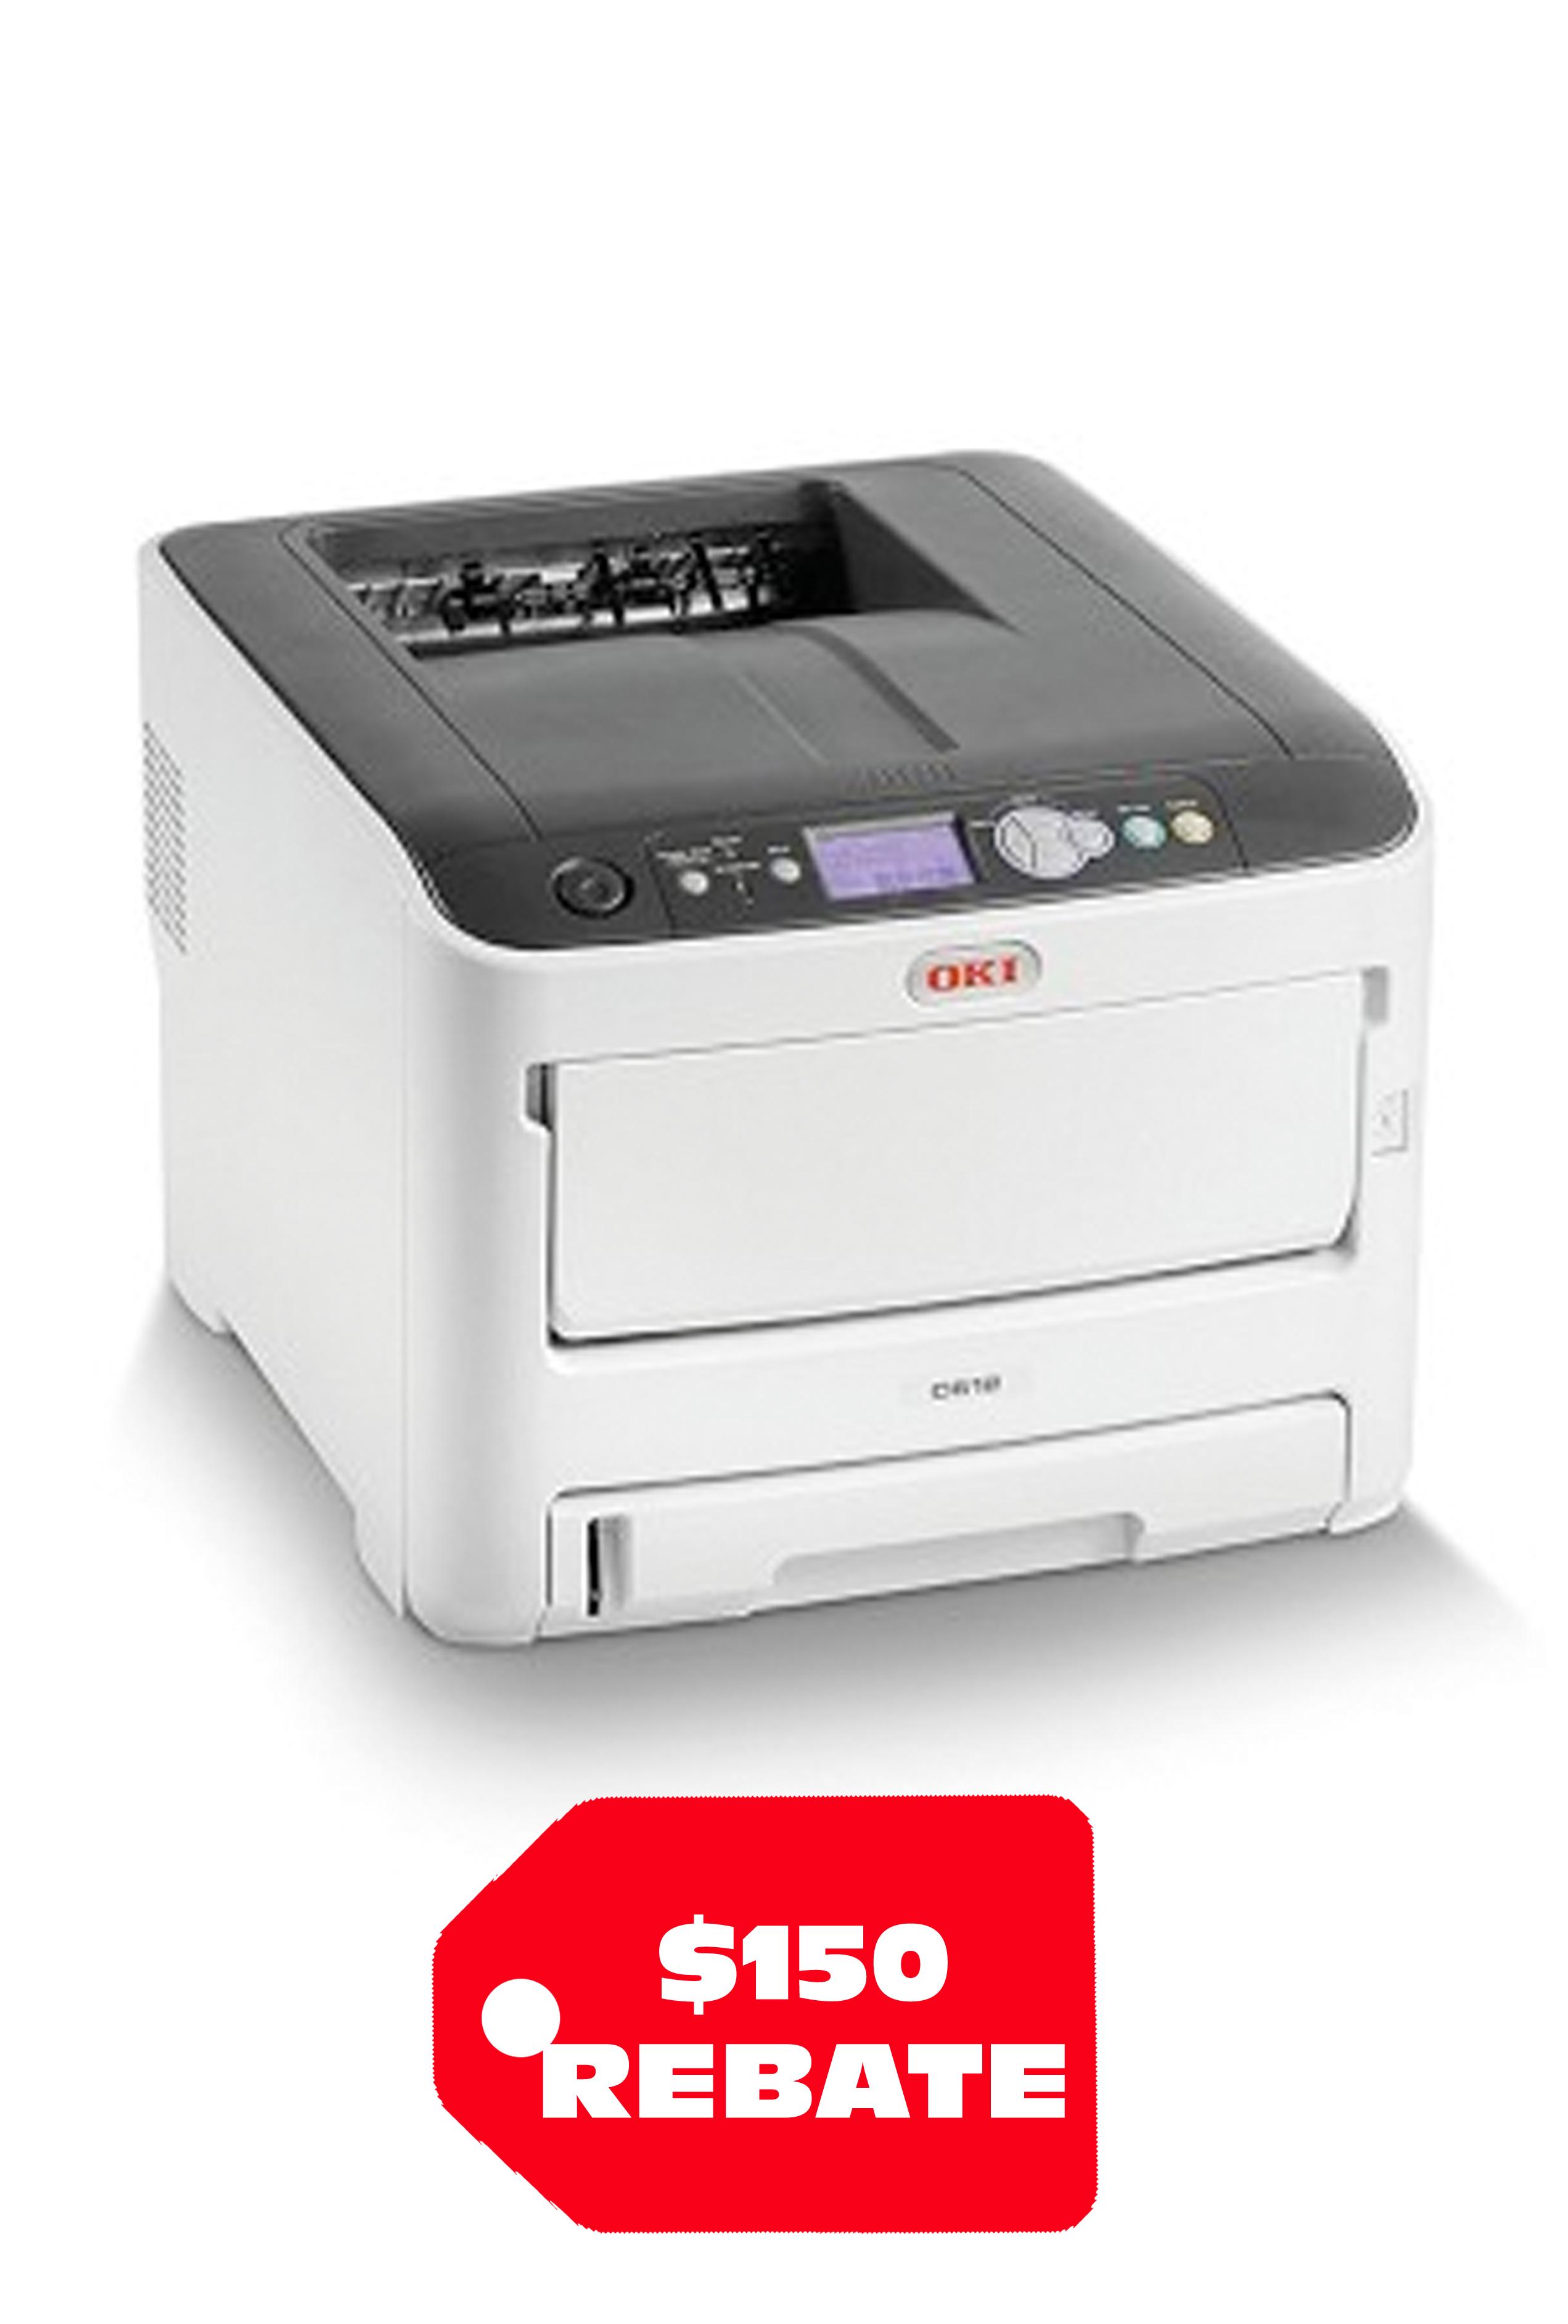 Okidata OKI C612dn Digital Color Printer (34ppm)